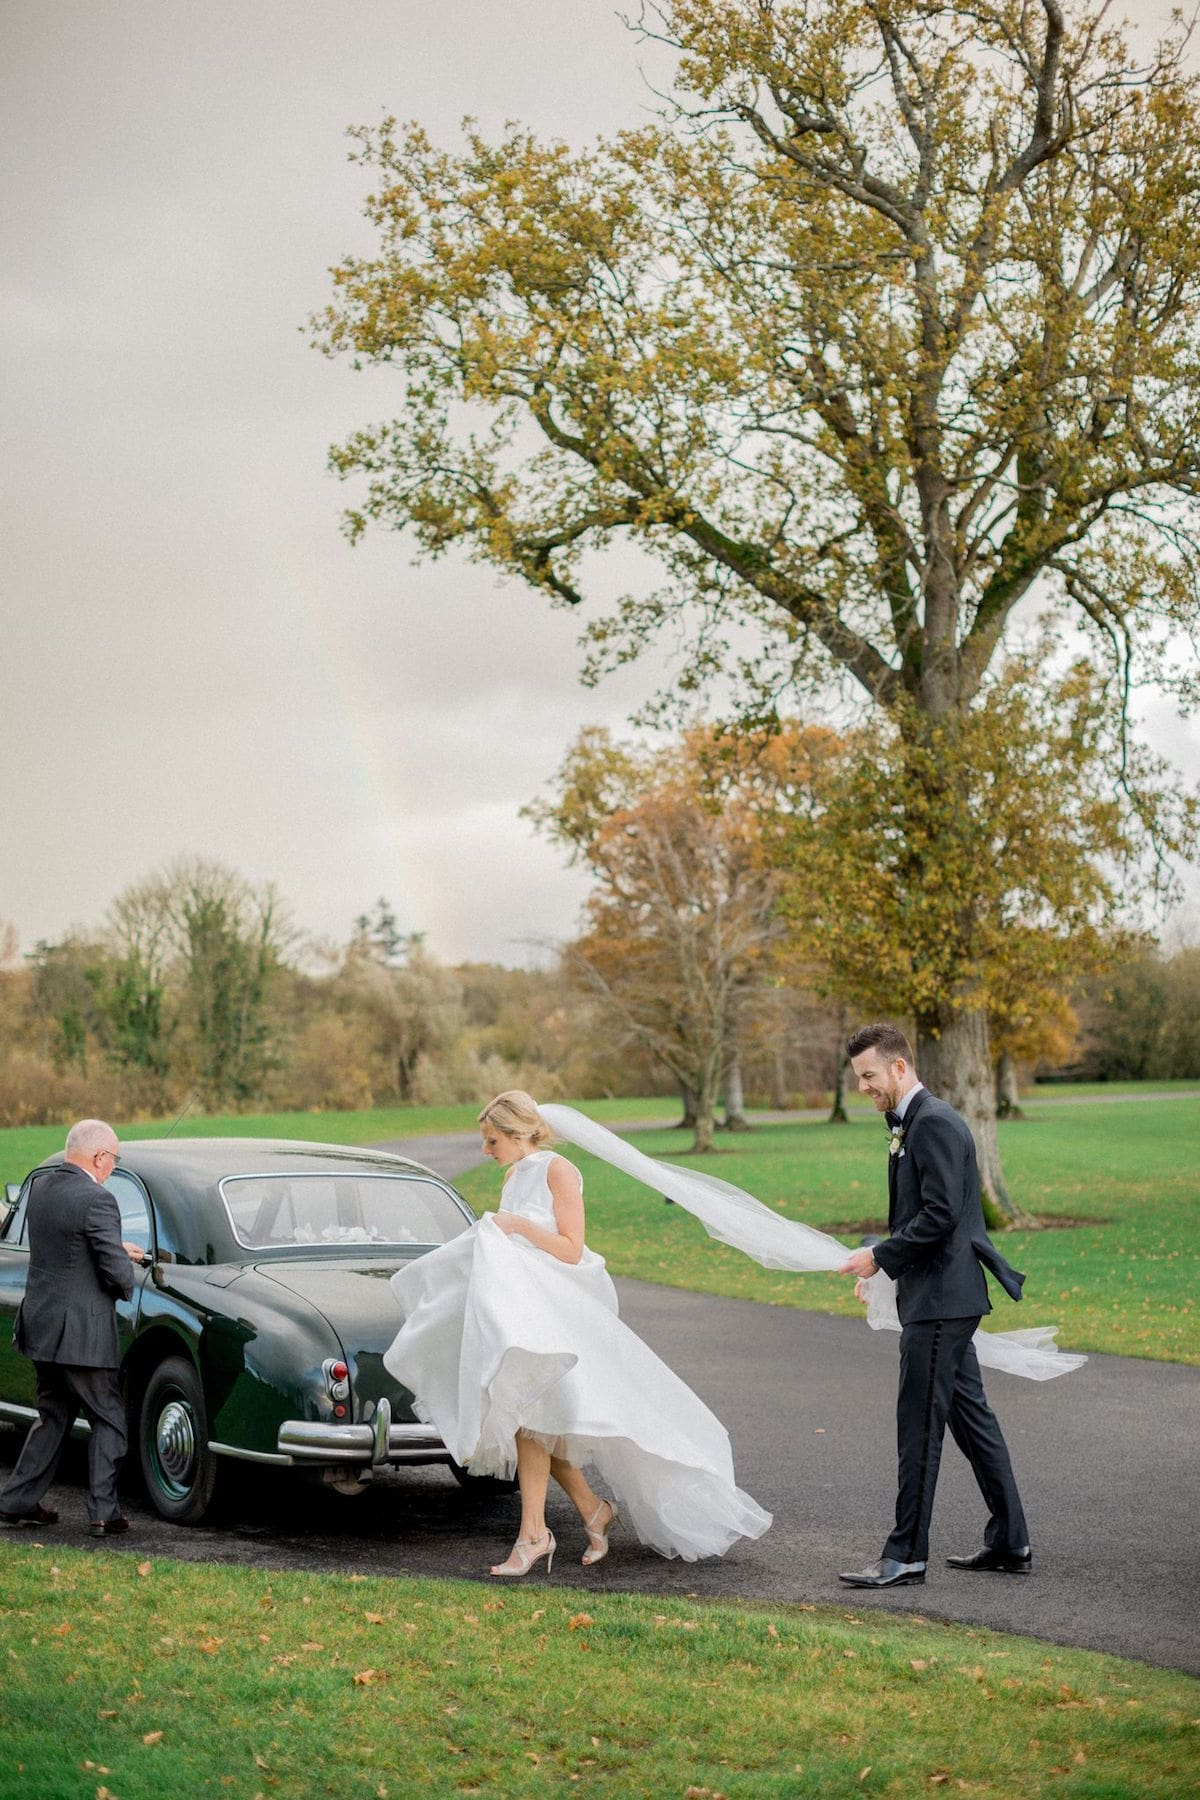 Green Bentley wedding car